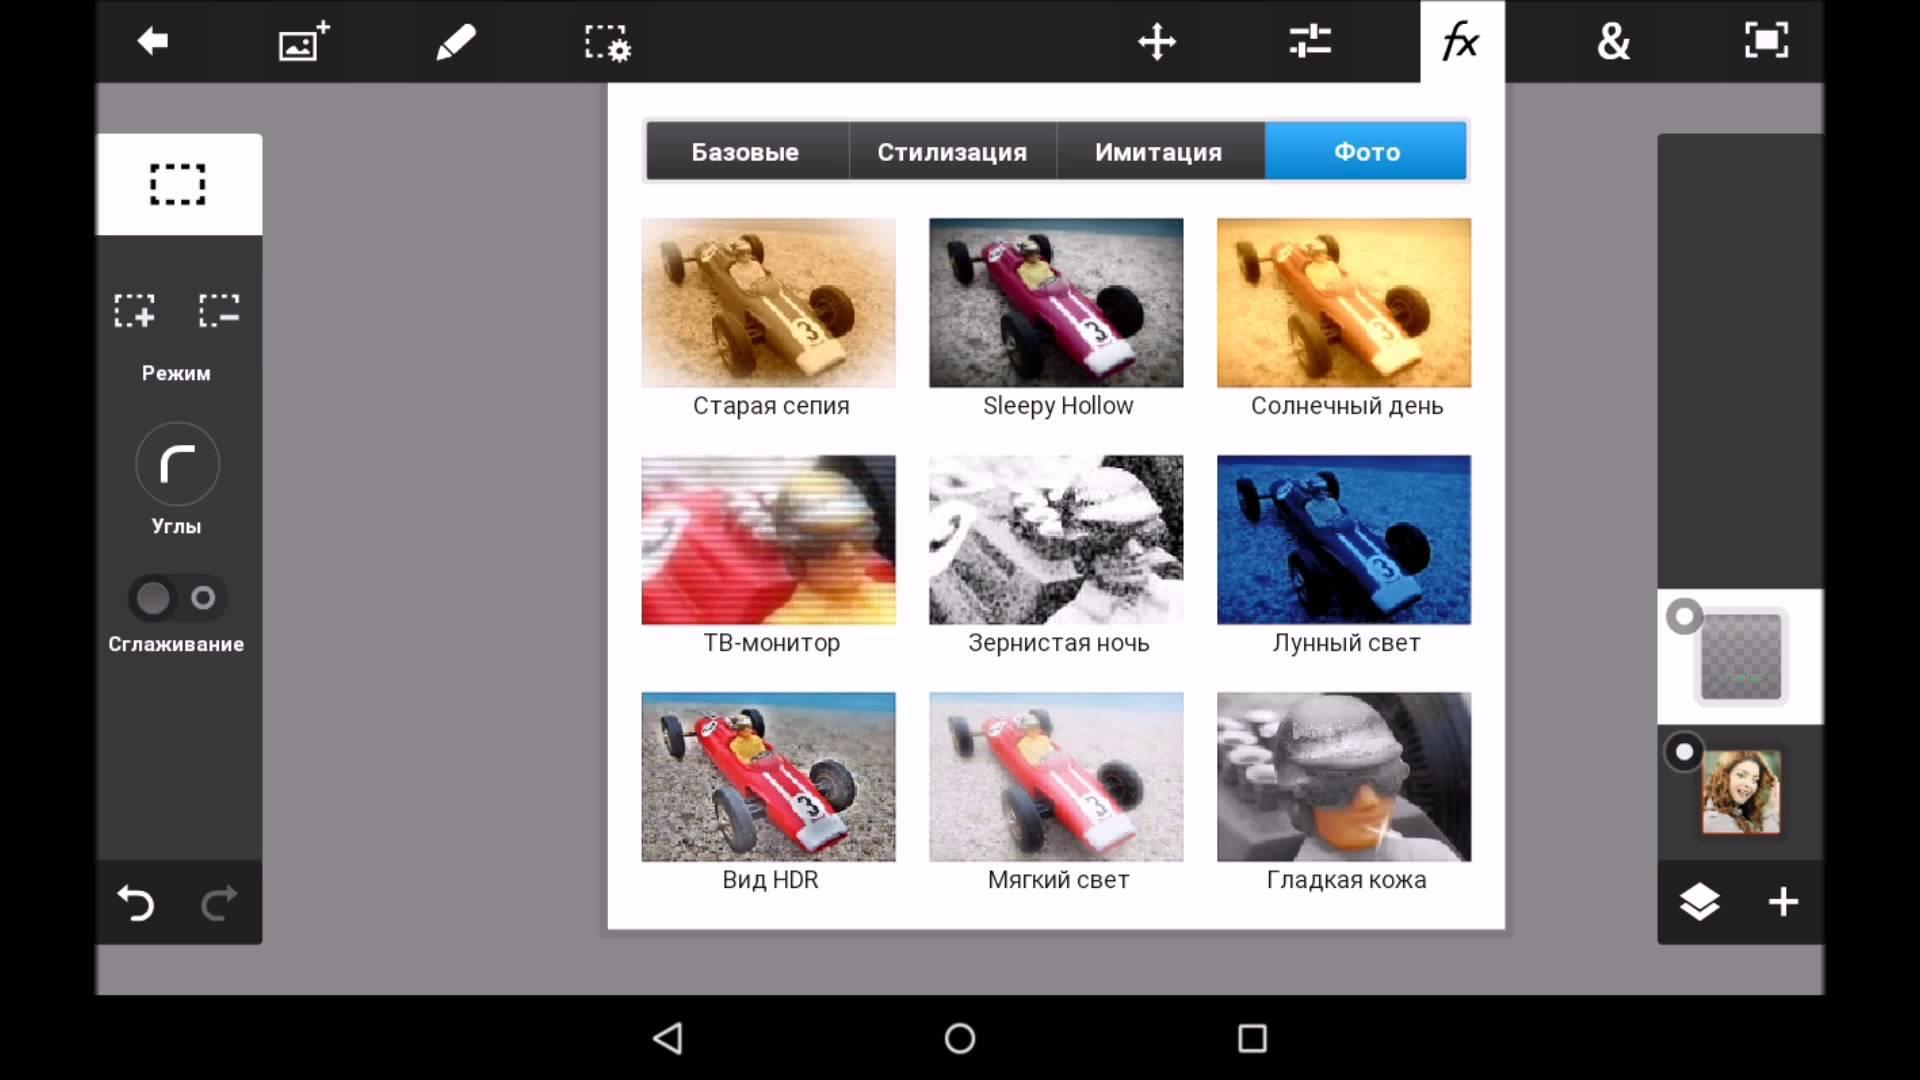 скачать adobe photoshop touch на андроид